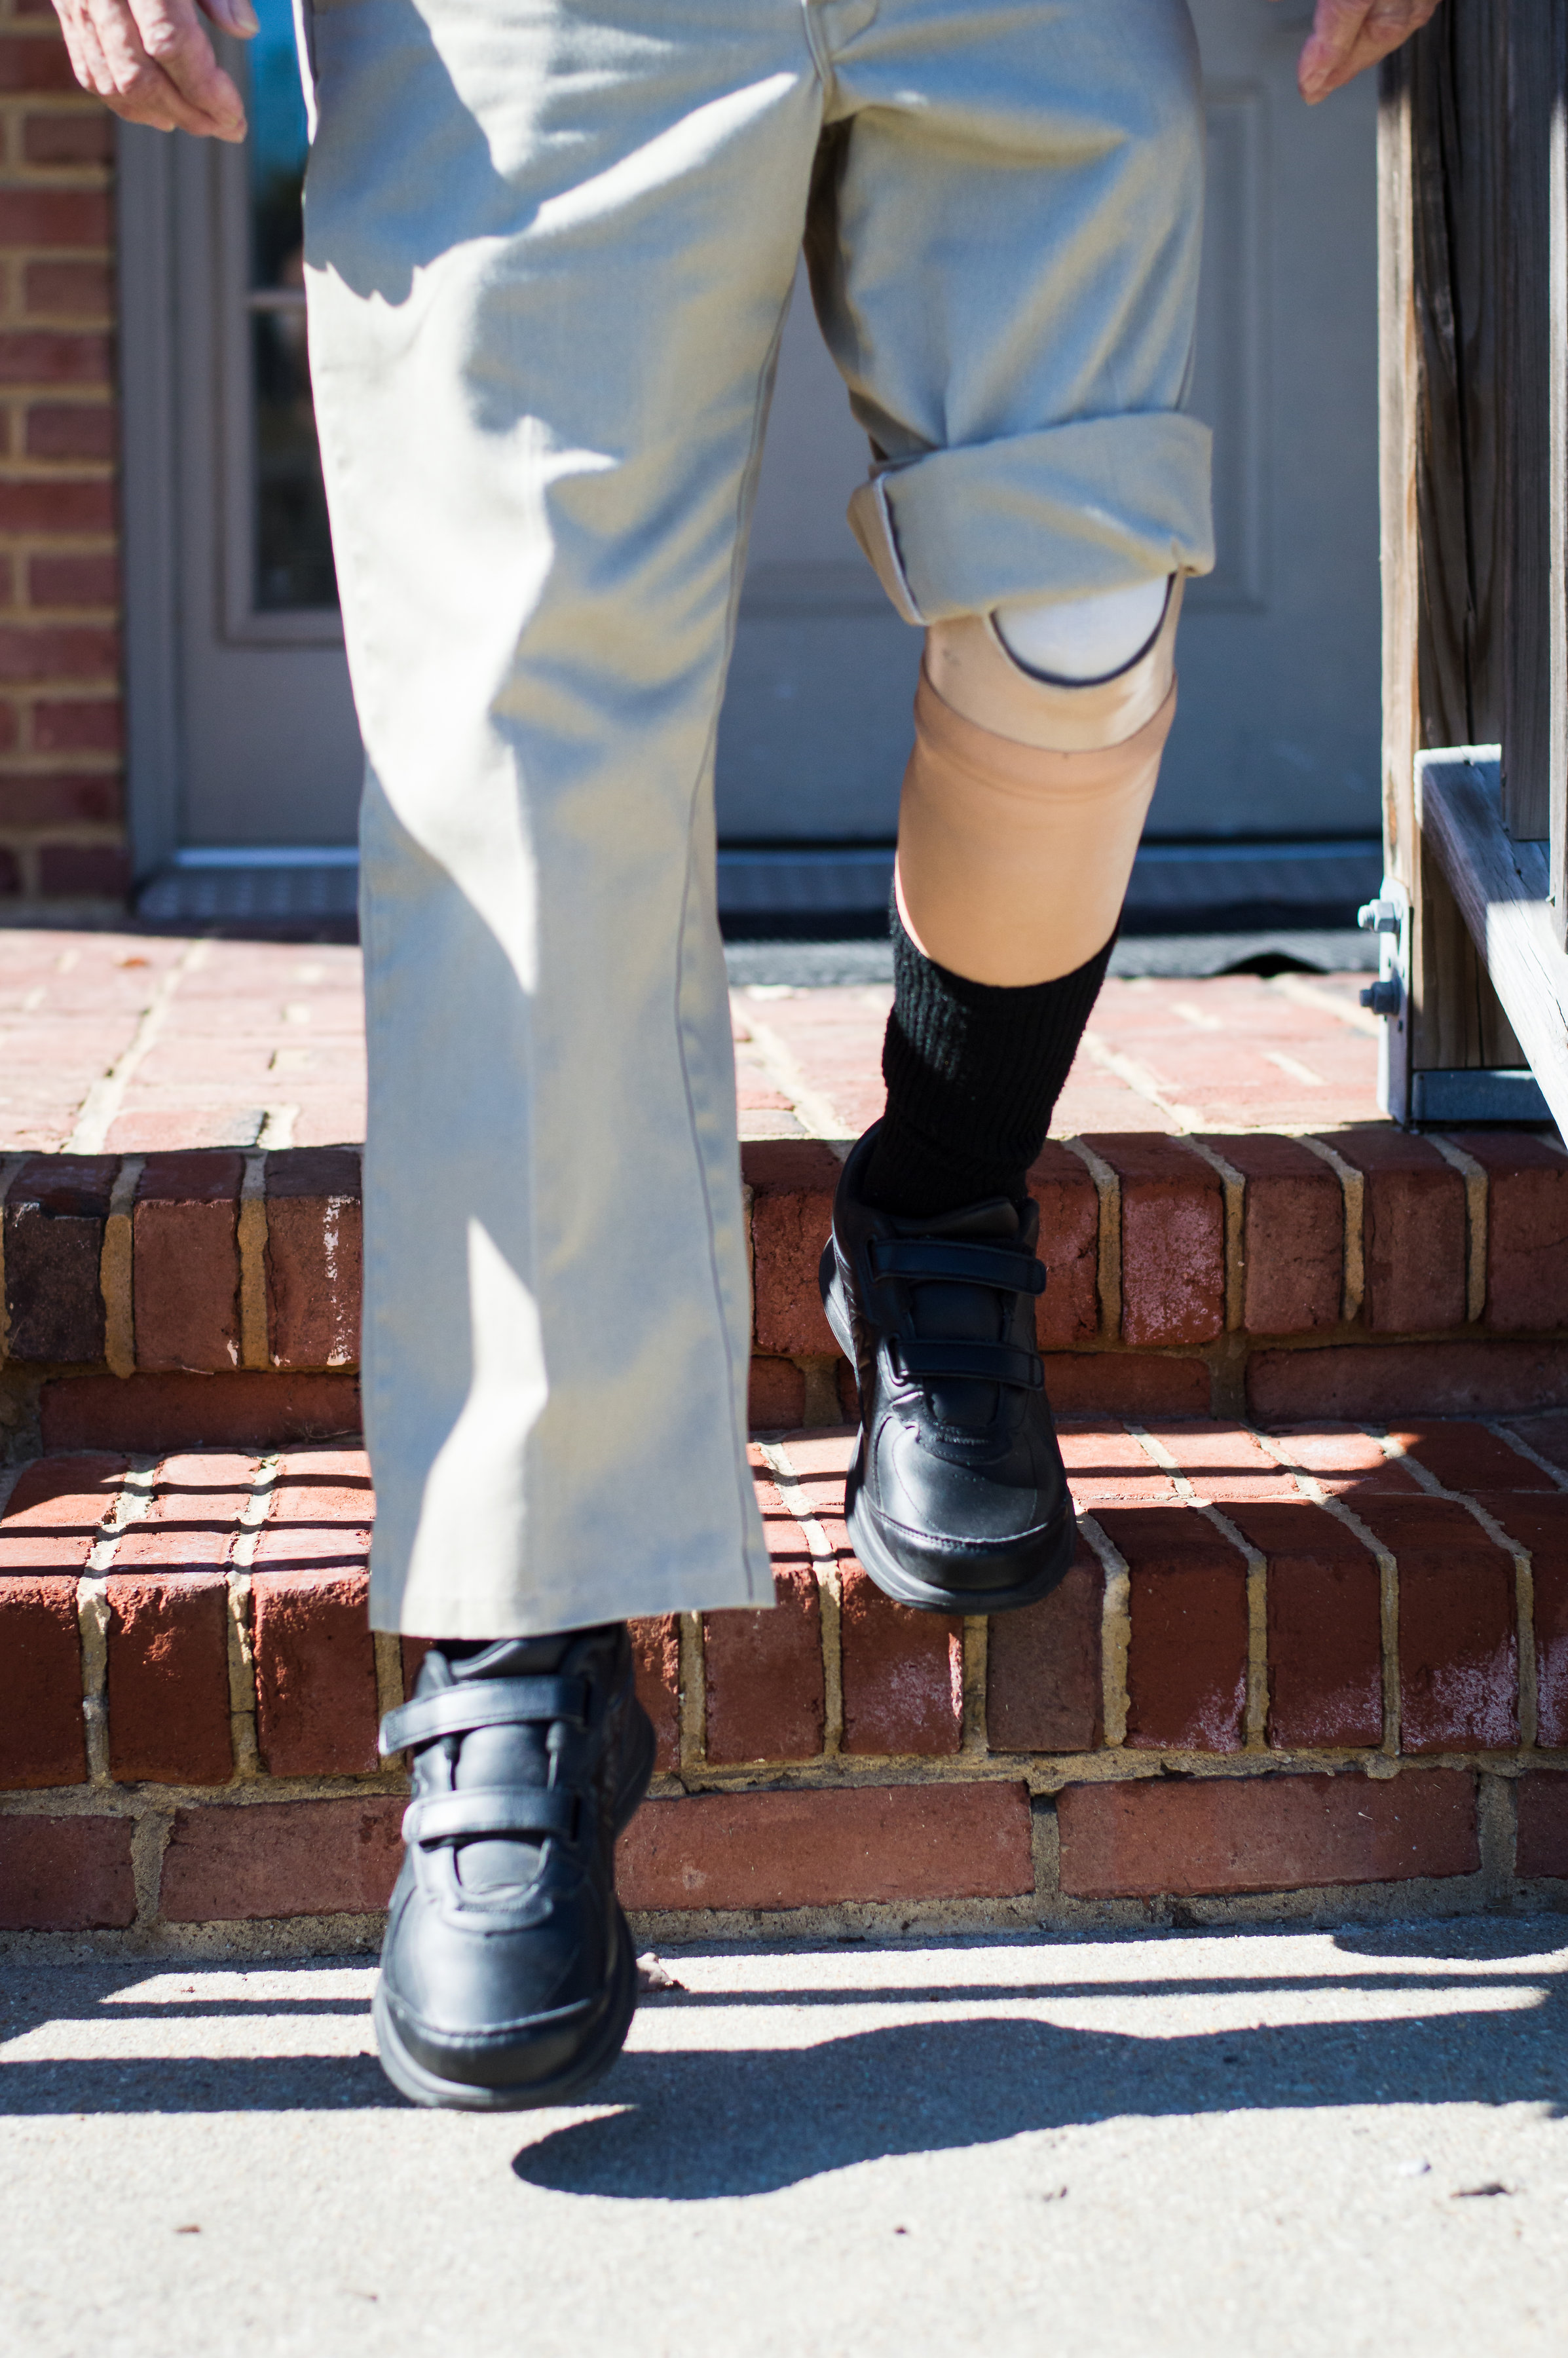 prosthetics, orthotics, veterans,di6